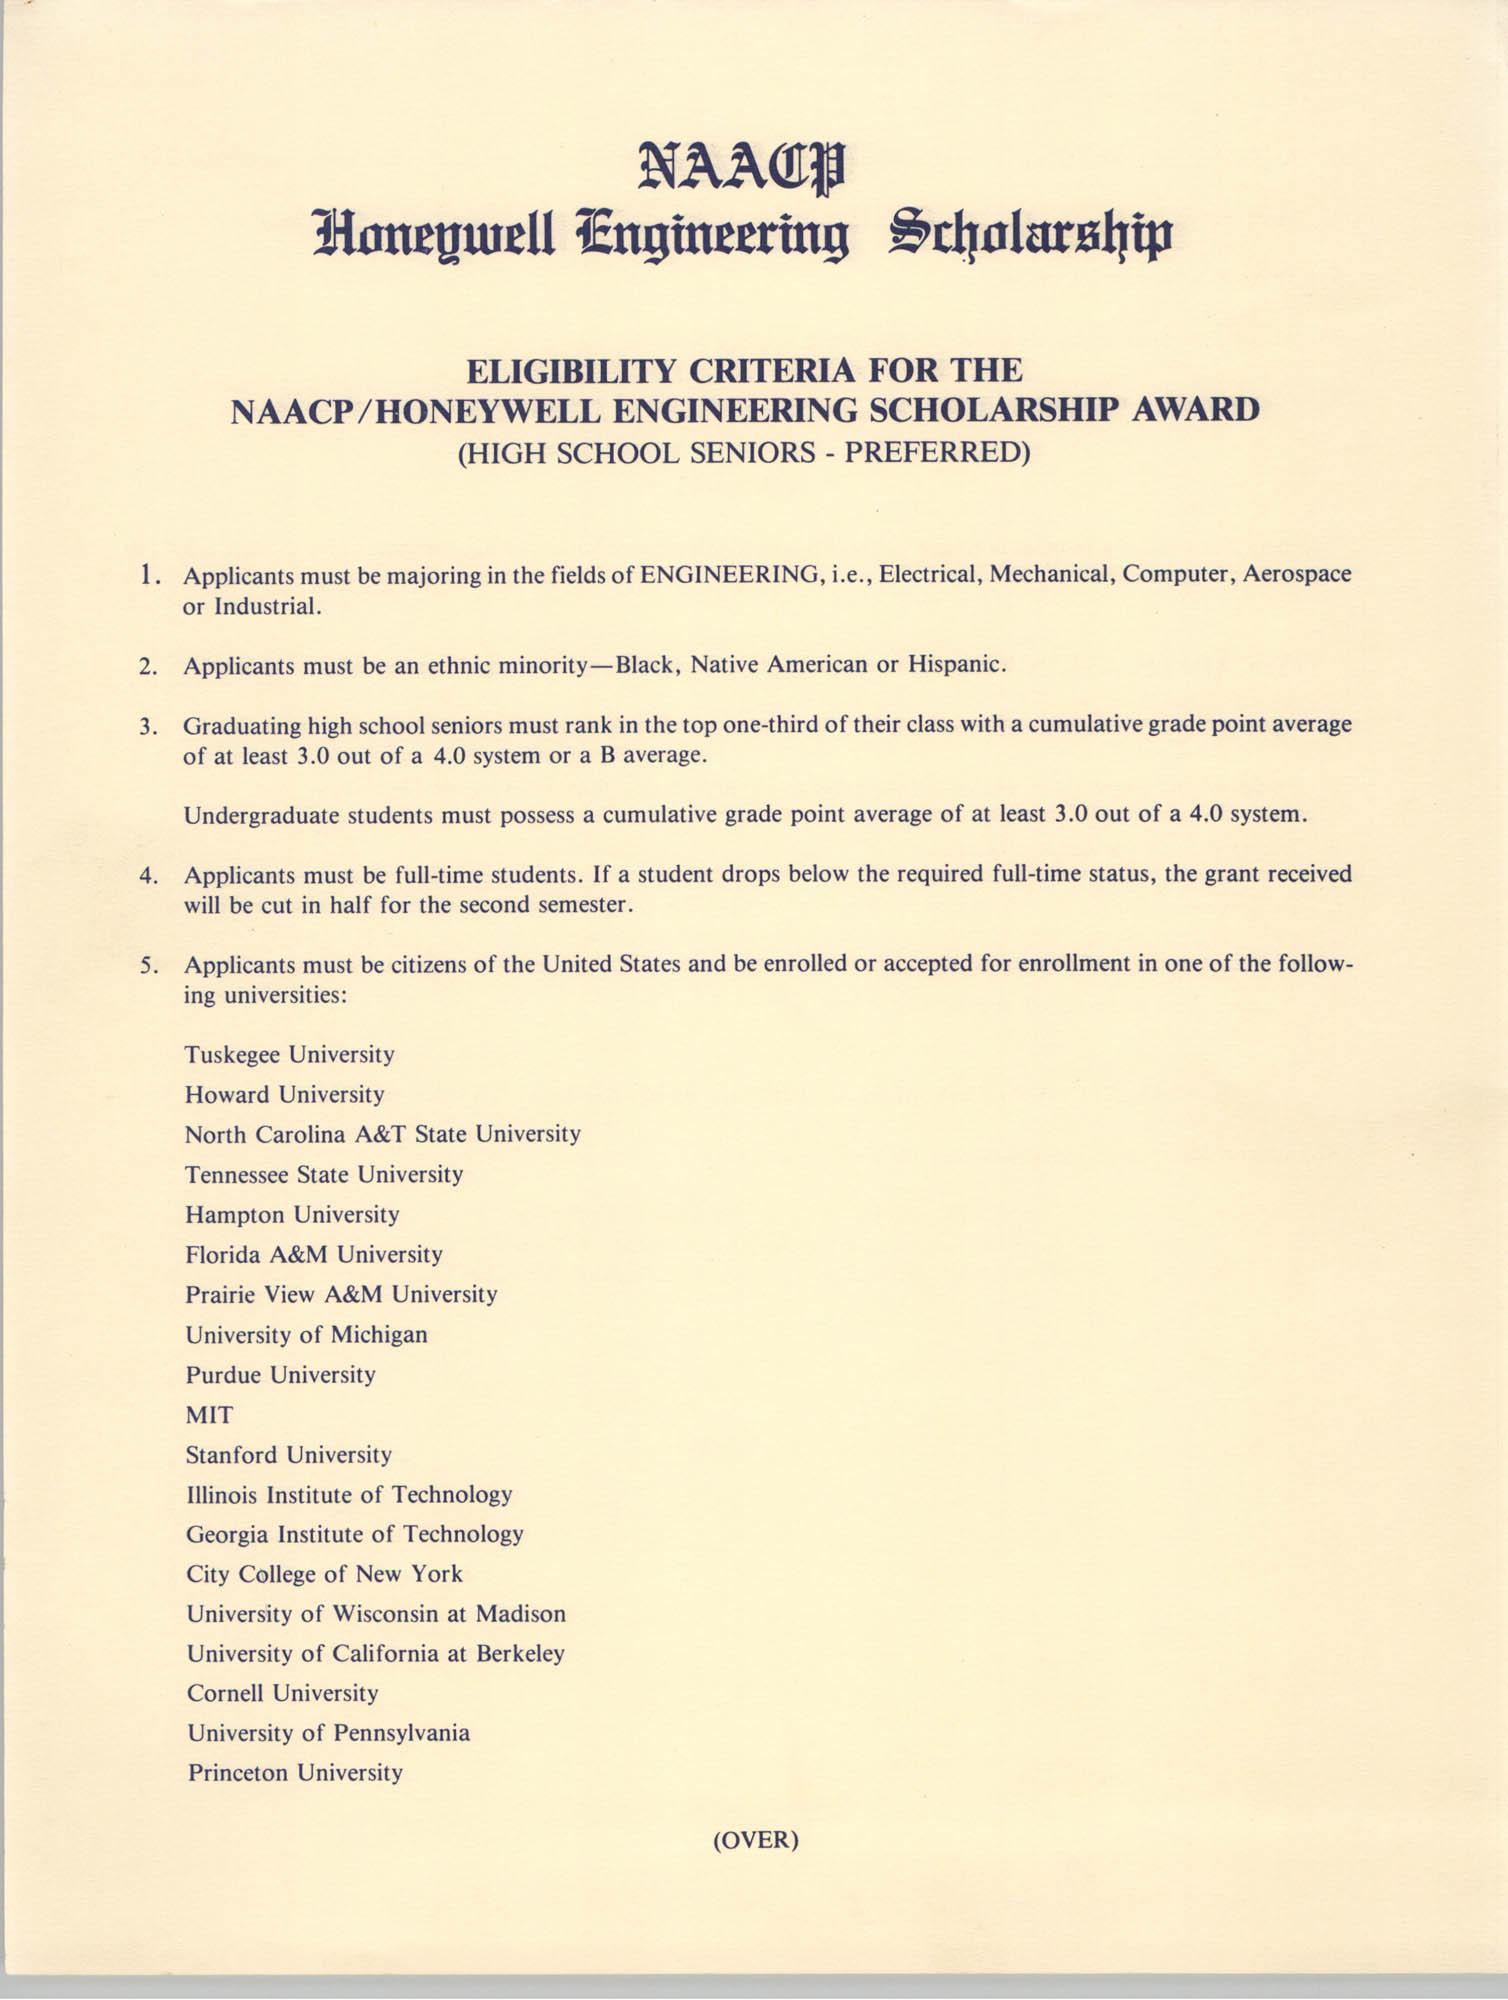 Application Instructions, NAACP Honeywell Engineering Scholarship